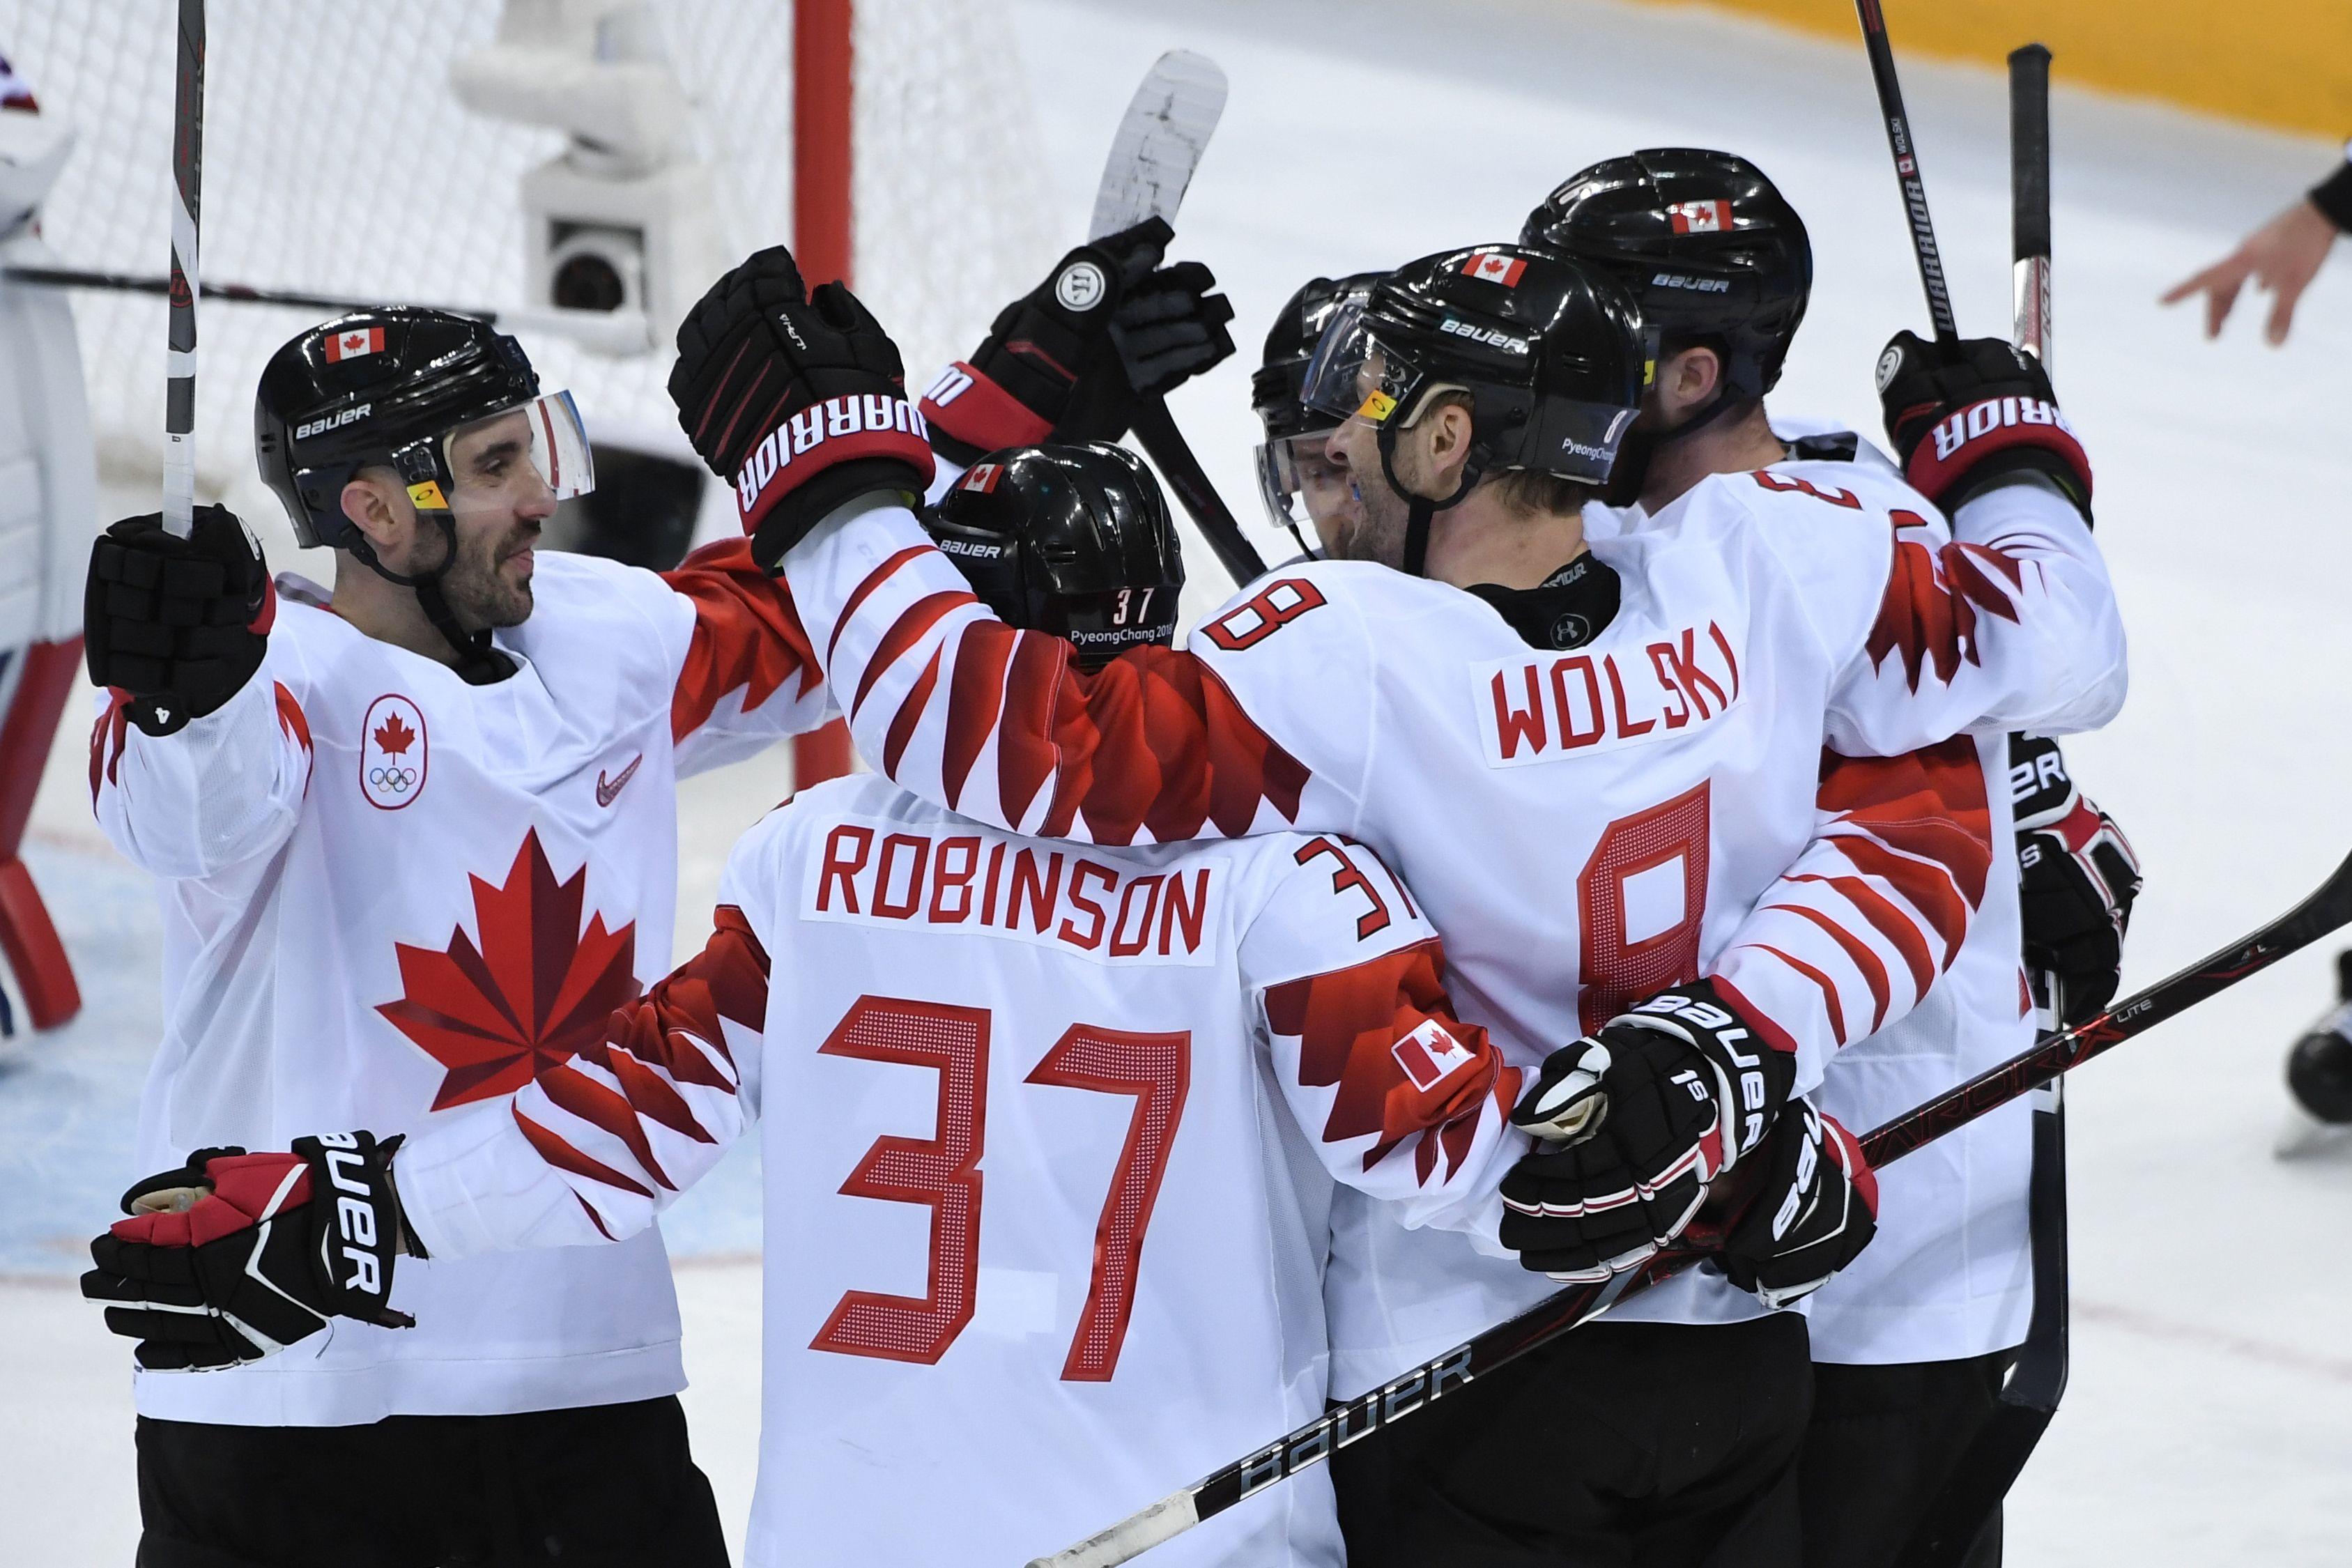 48b6d1c6dde Google News - Ice Hockey at the 2018 Winter Olympics - Men - Latest